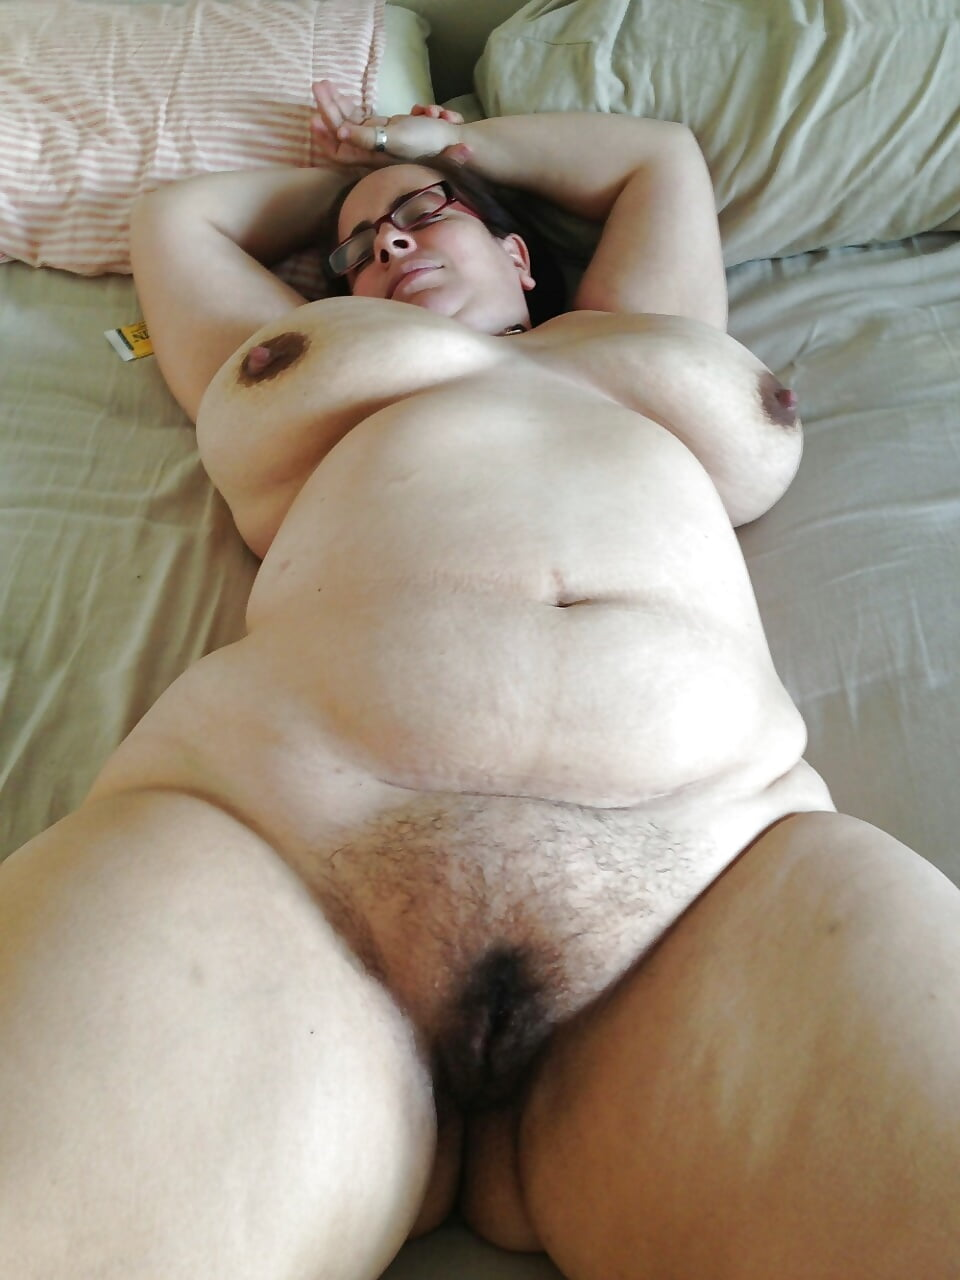 Mature bbw hairy pussy spread